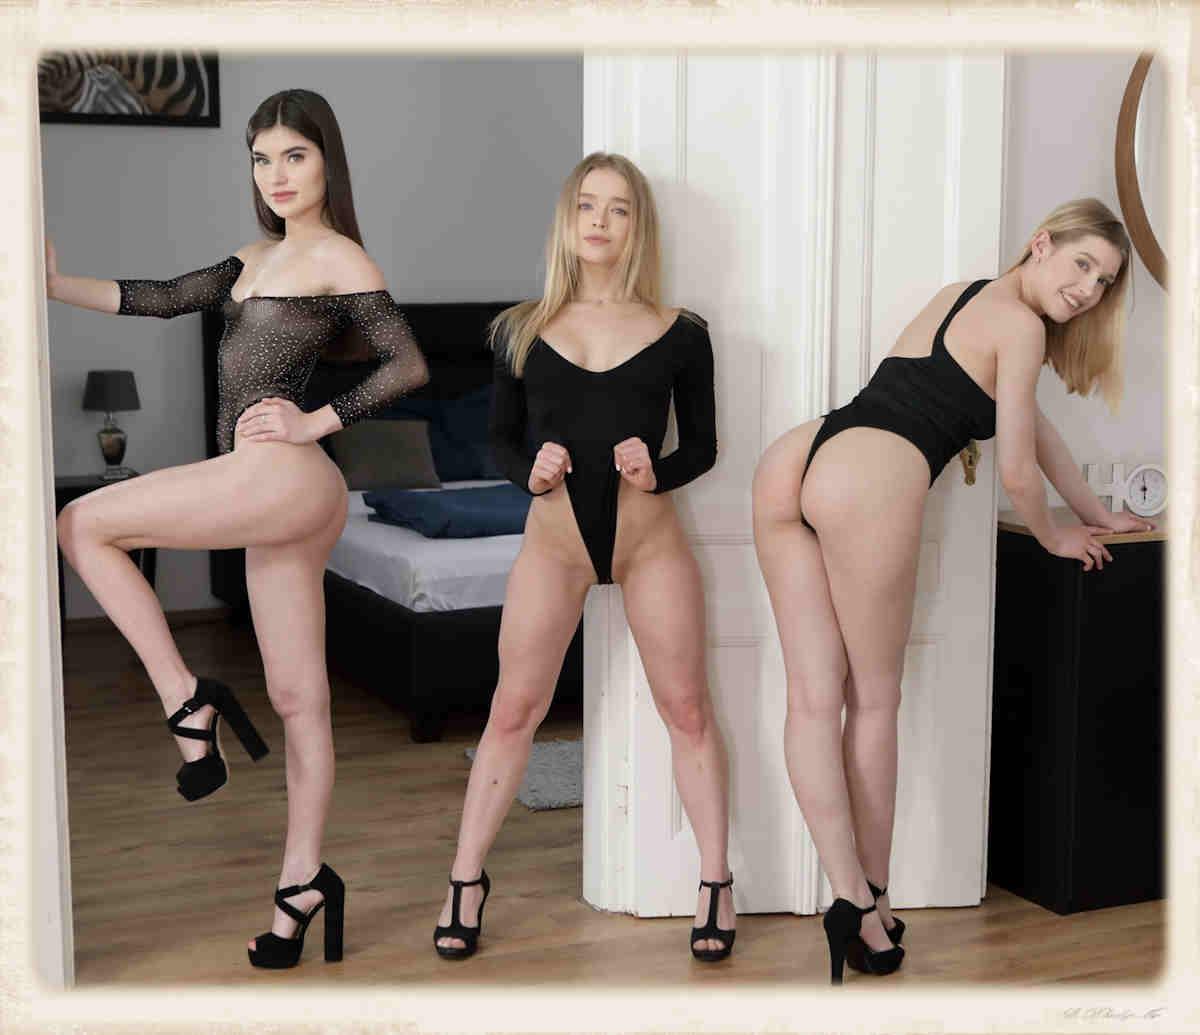 Virtual Taboo Meet The Slut Squad Freya Maye, Alexa Flexy and Stefany Kyler